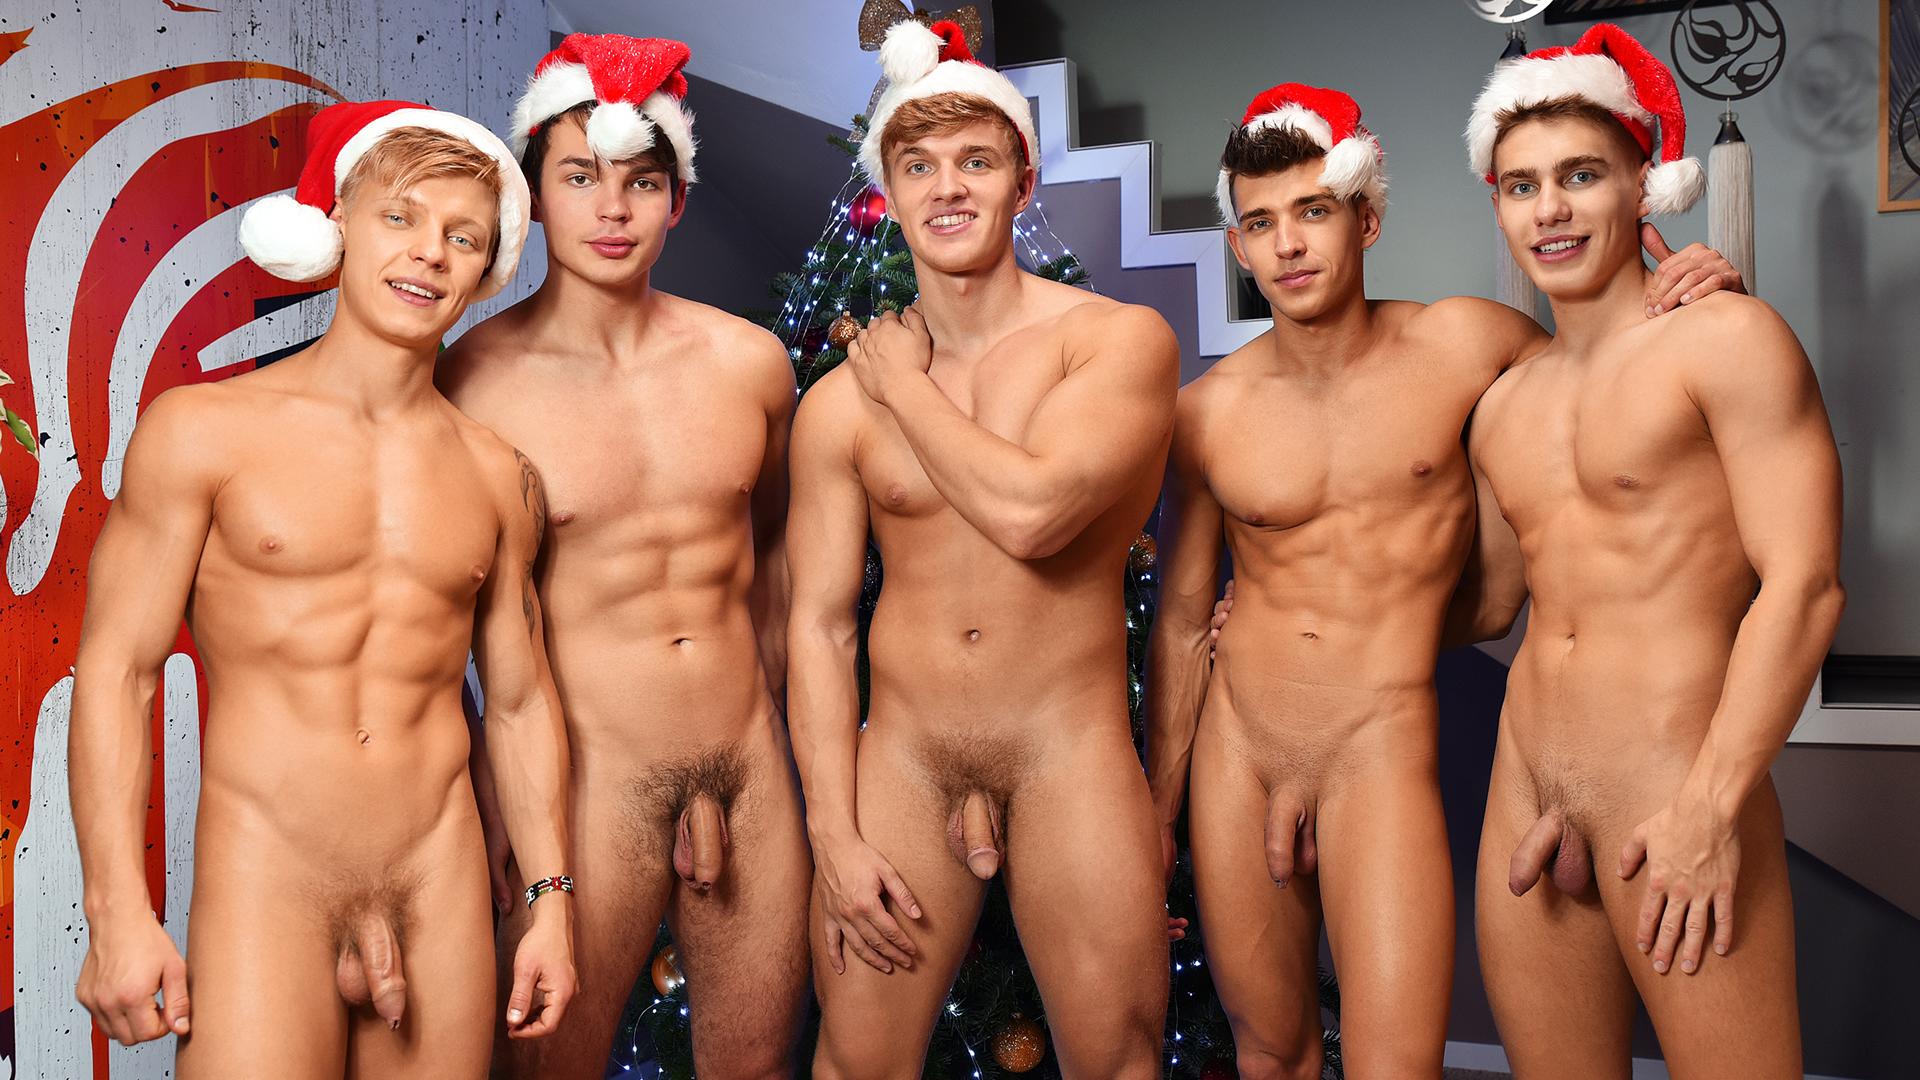 Full-Frontal Five Studs in Santa Hats